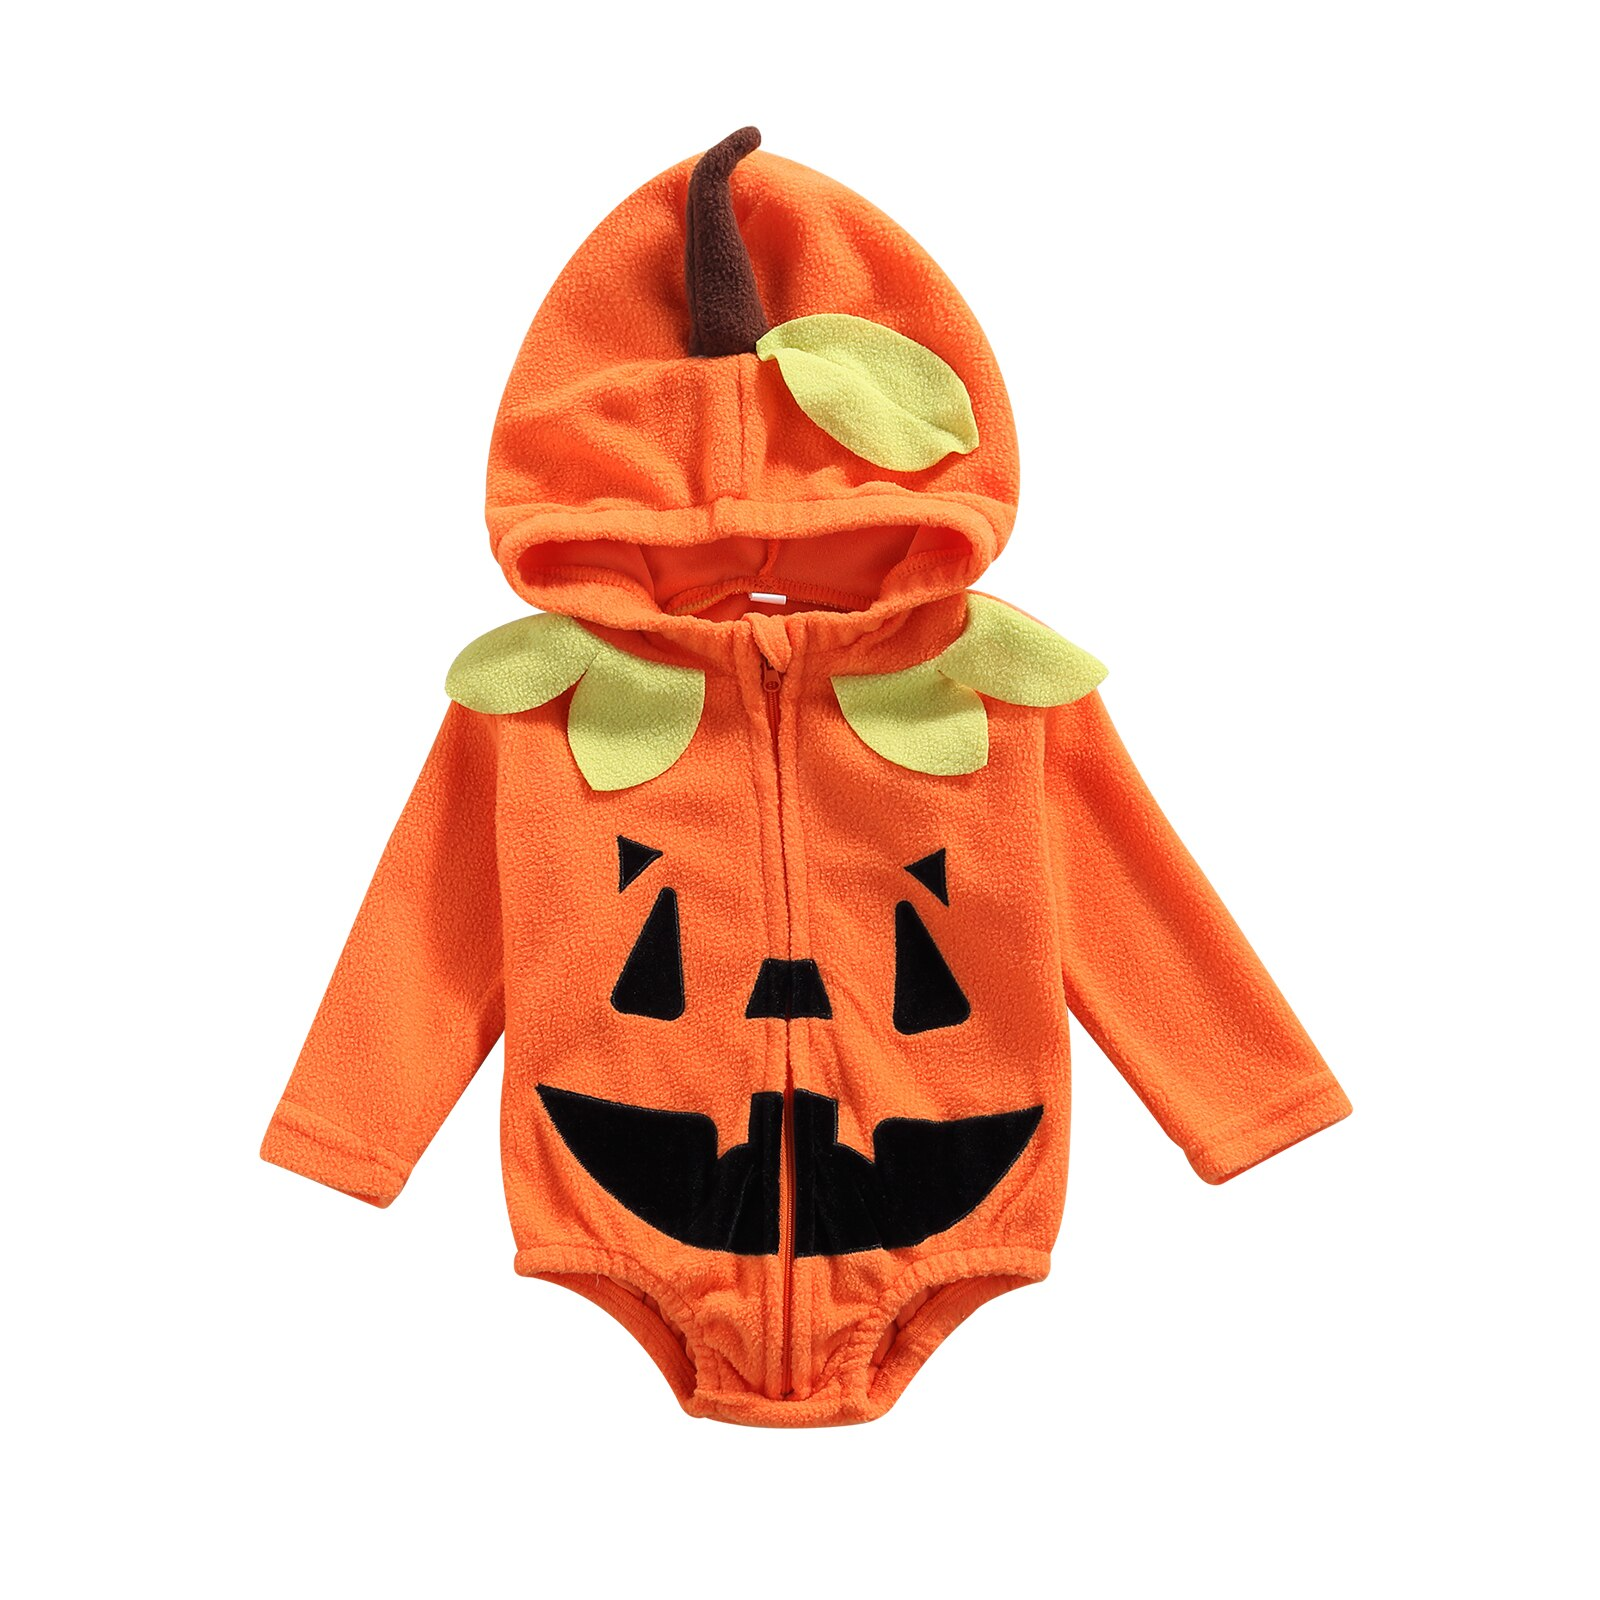 Baby Clothes Halloween Zip-up Romper Baby Boy Girl Bodysuit Orange Pumpkin Shaped Long Sleeve Hooded Clothing 0-24M